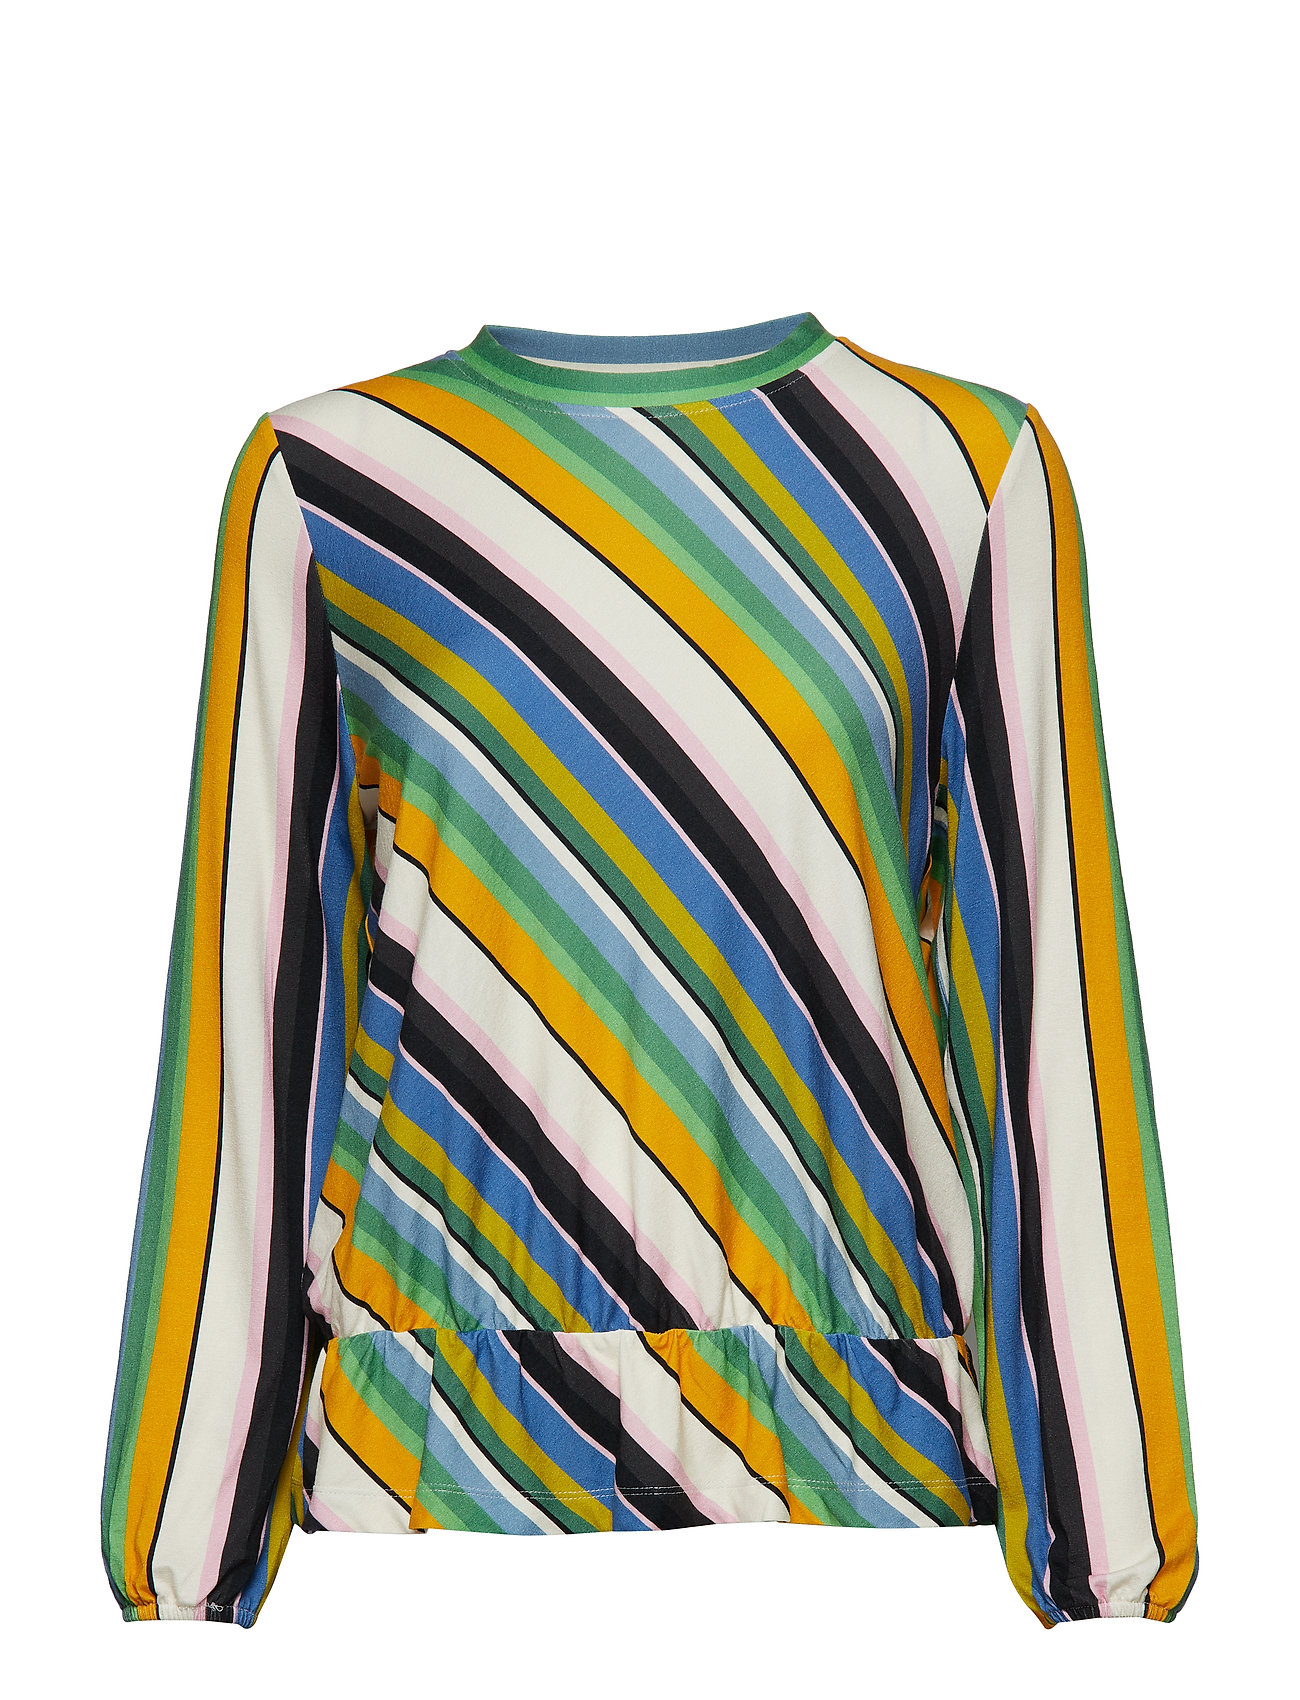 ce2e5c9bc0f0 Forever Stripe Bonna (Multi) (£84) - Mads Nørgaard -